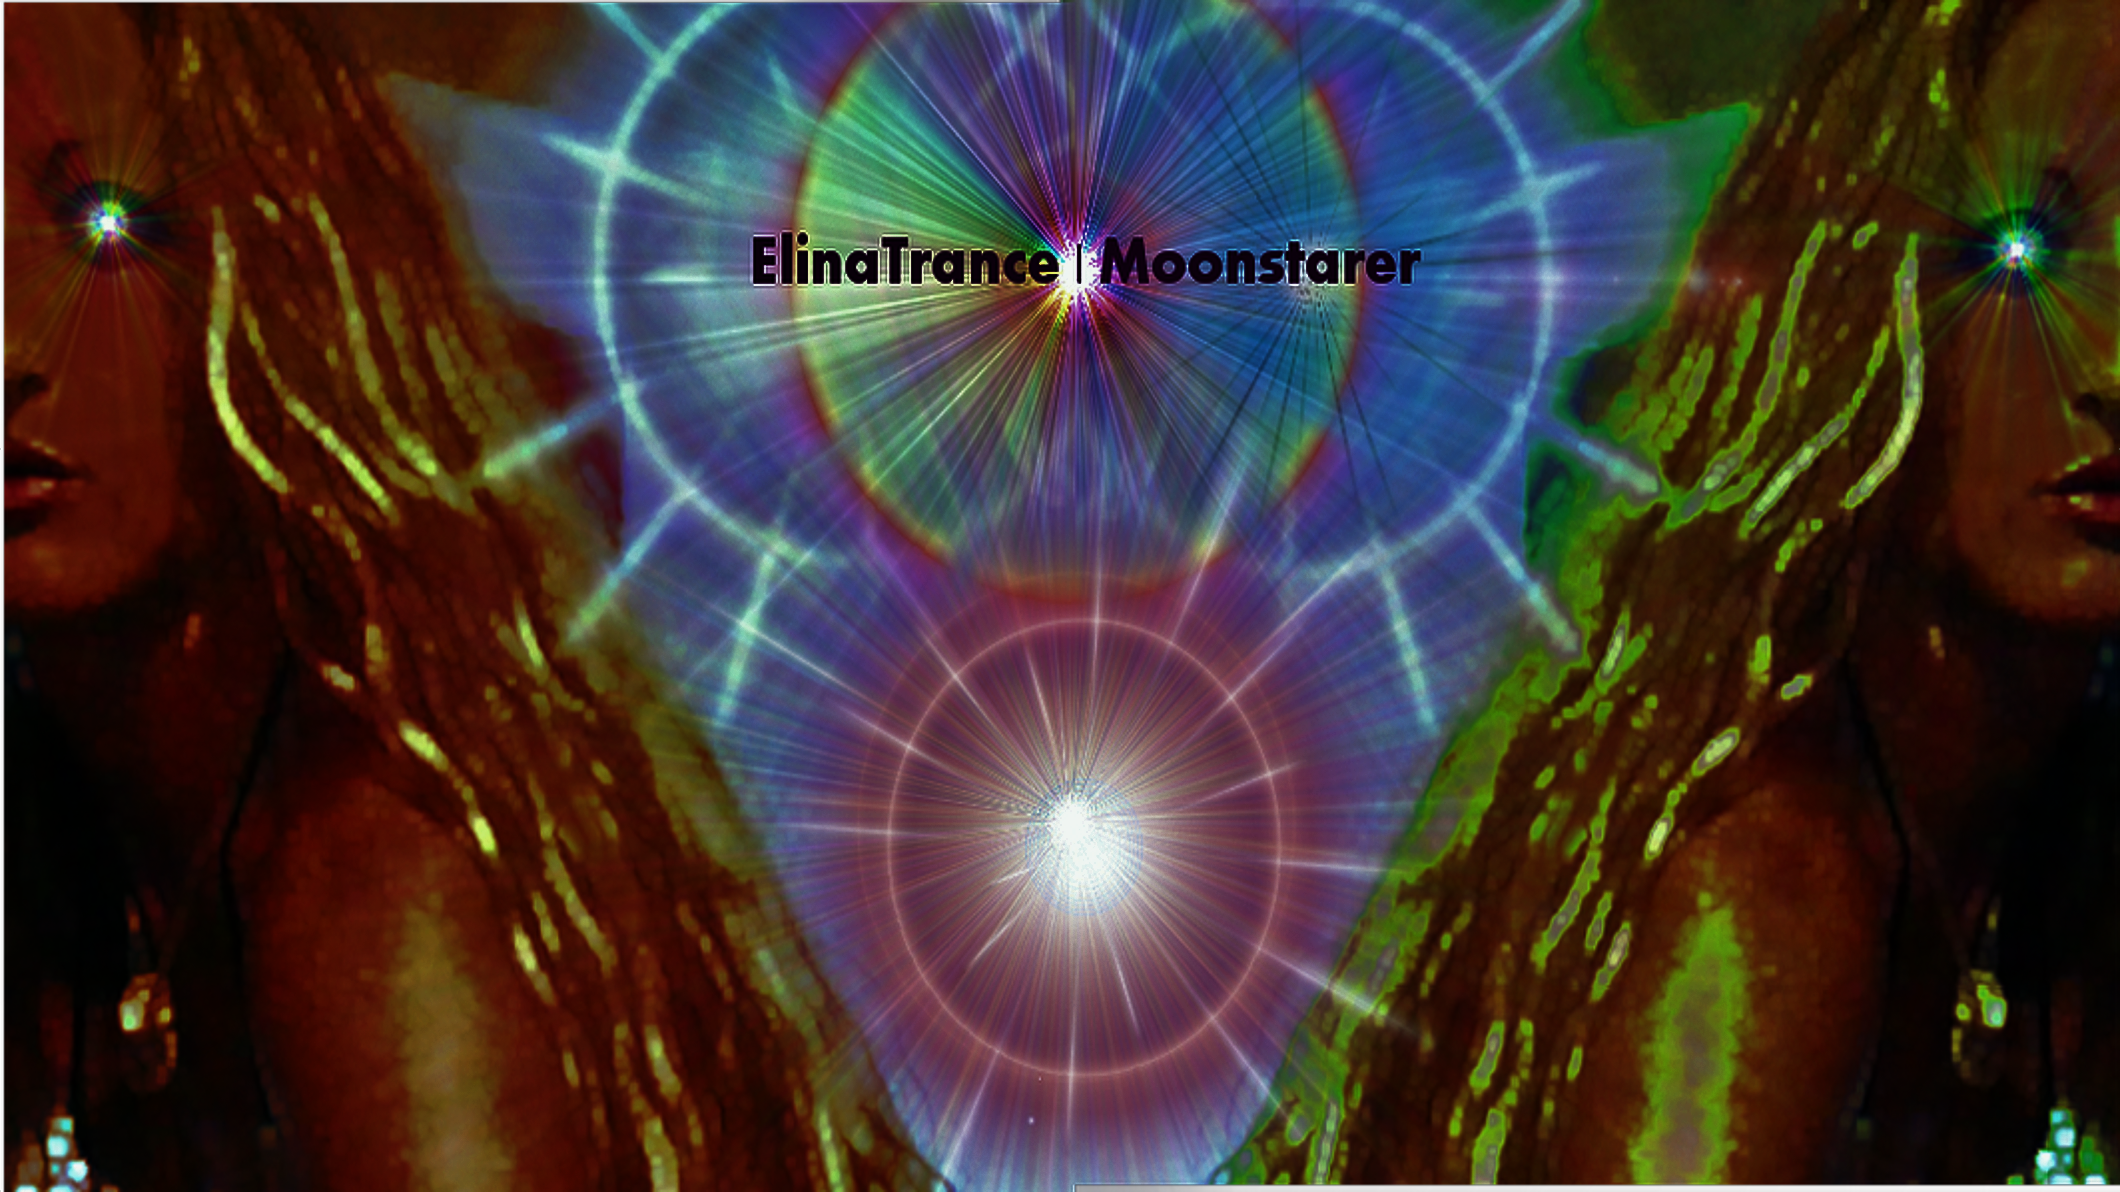 ElinaTrance013